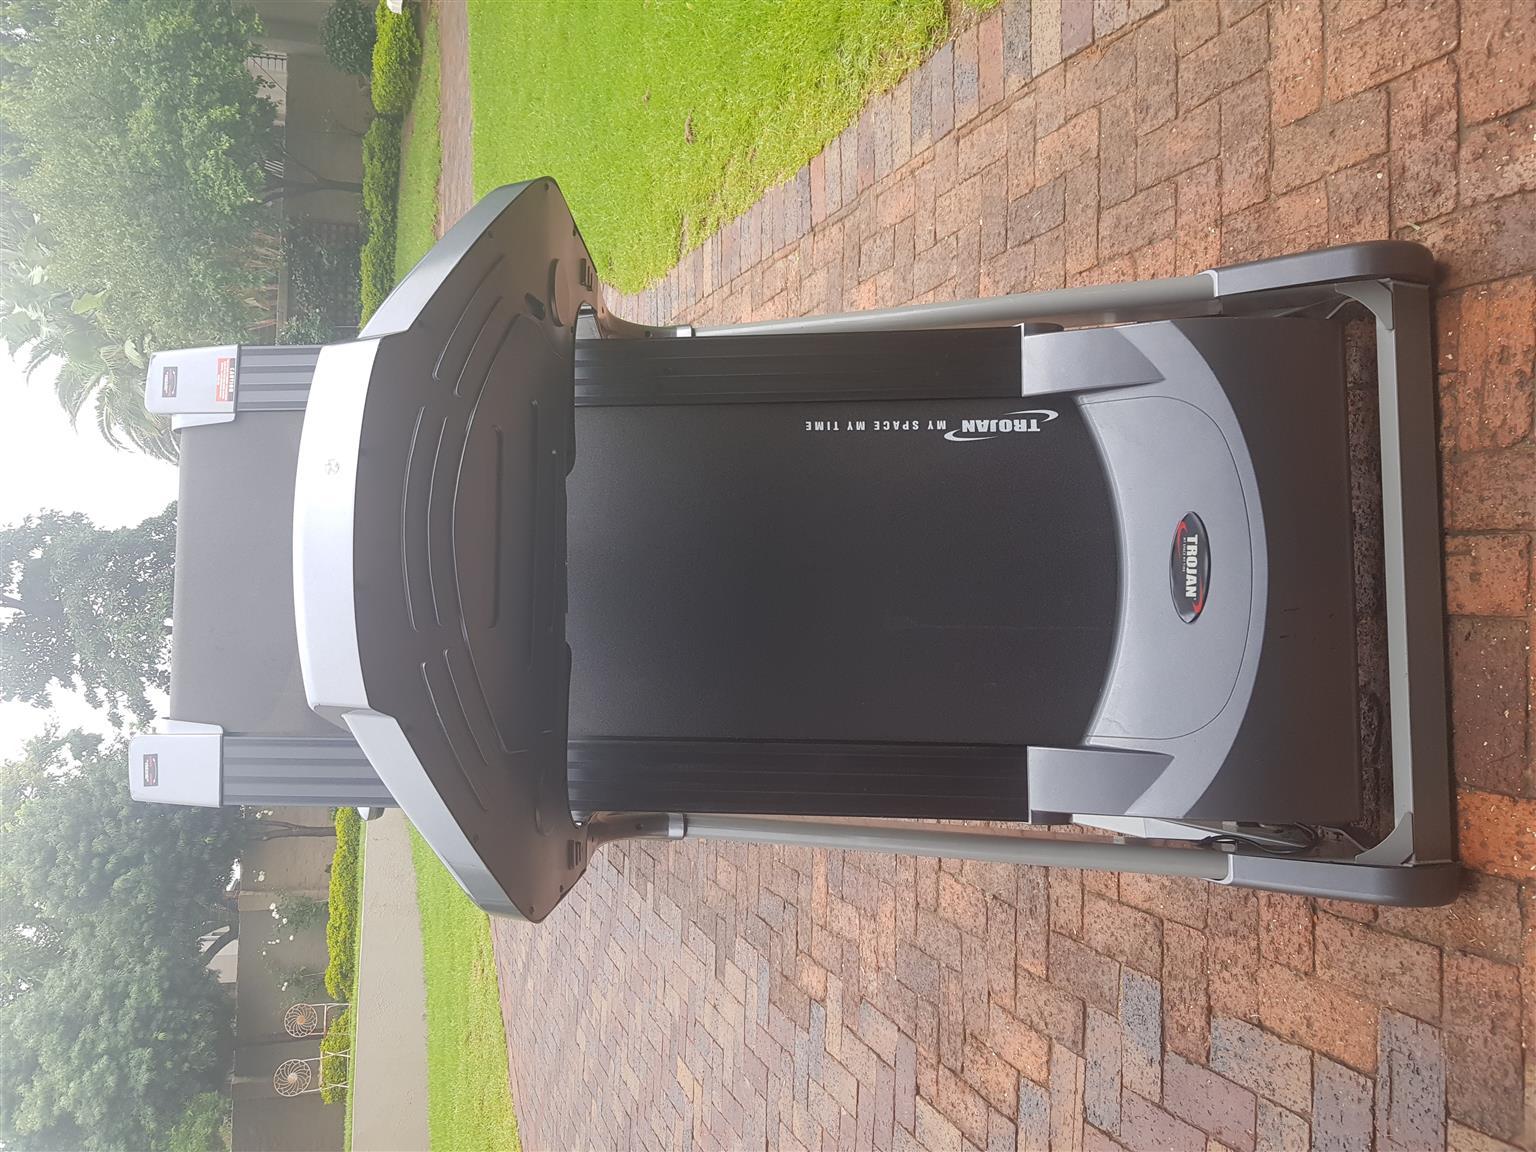 Iron man 500 treadmill for sale 1 year warranty